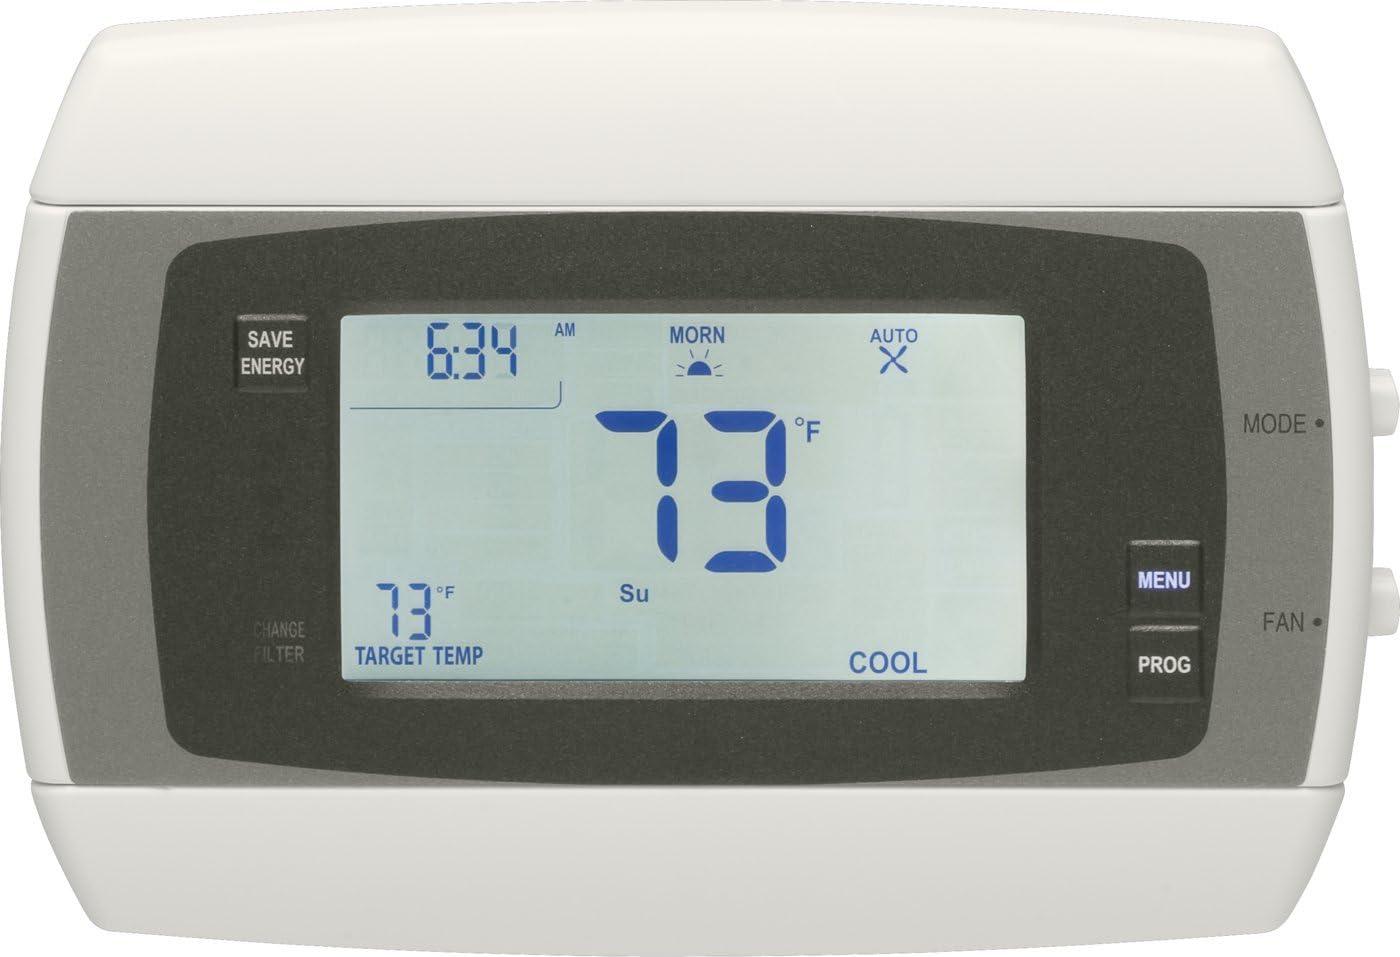 Japan's largest assortment Radio Virginia Beach Mall Thermostat Company of CT30e.C1.1.99.simple Program America